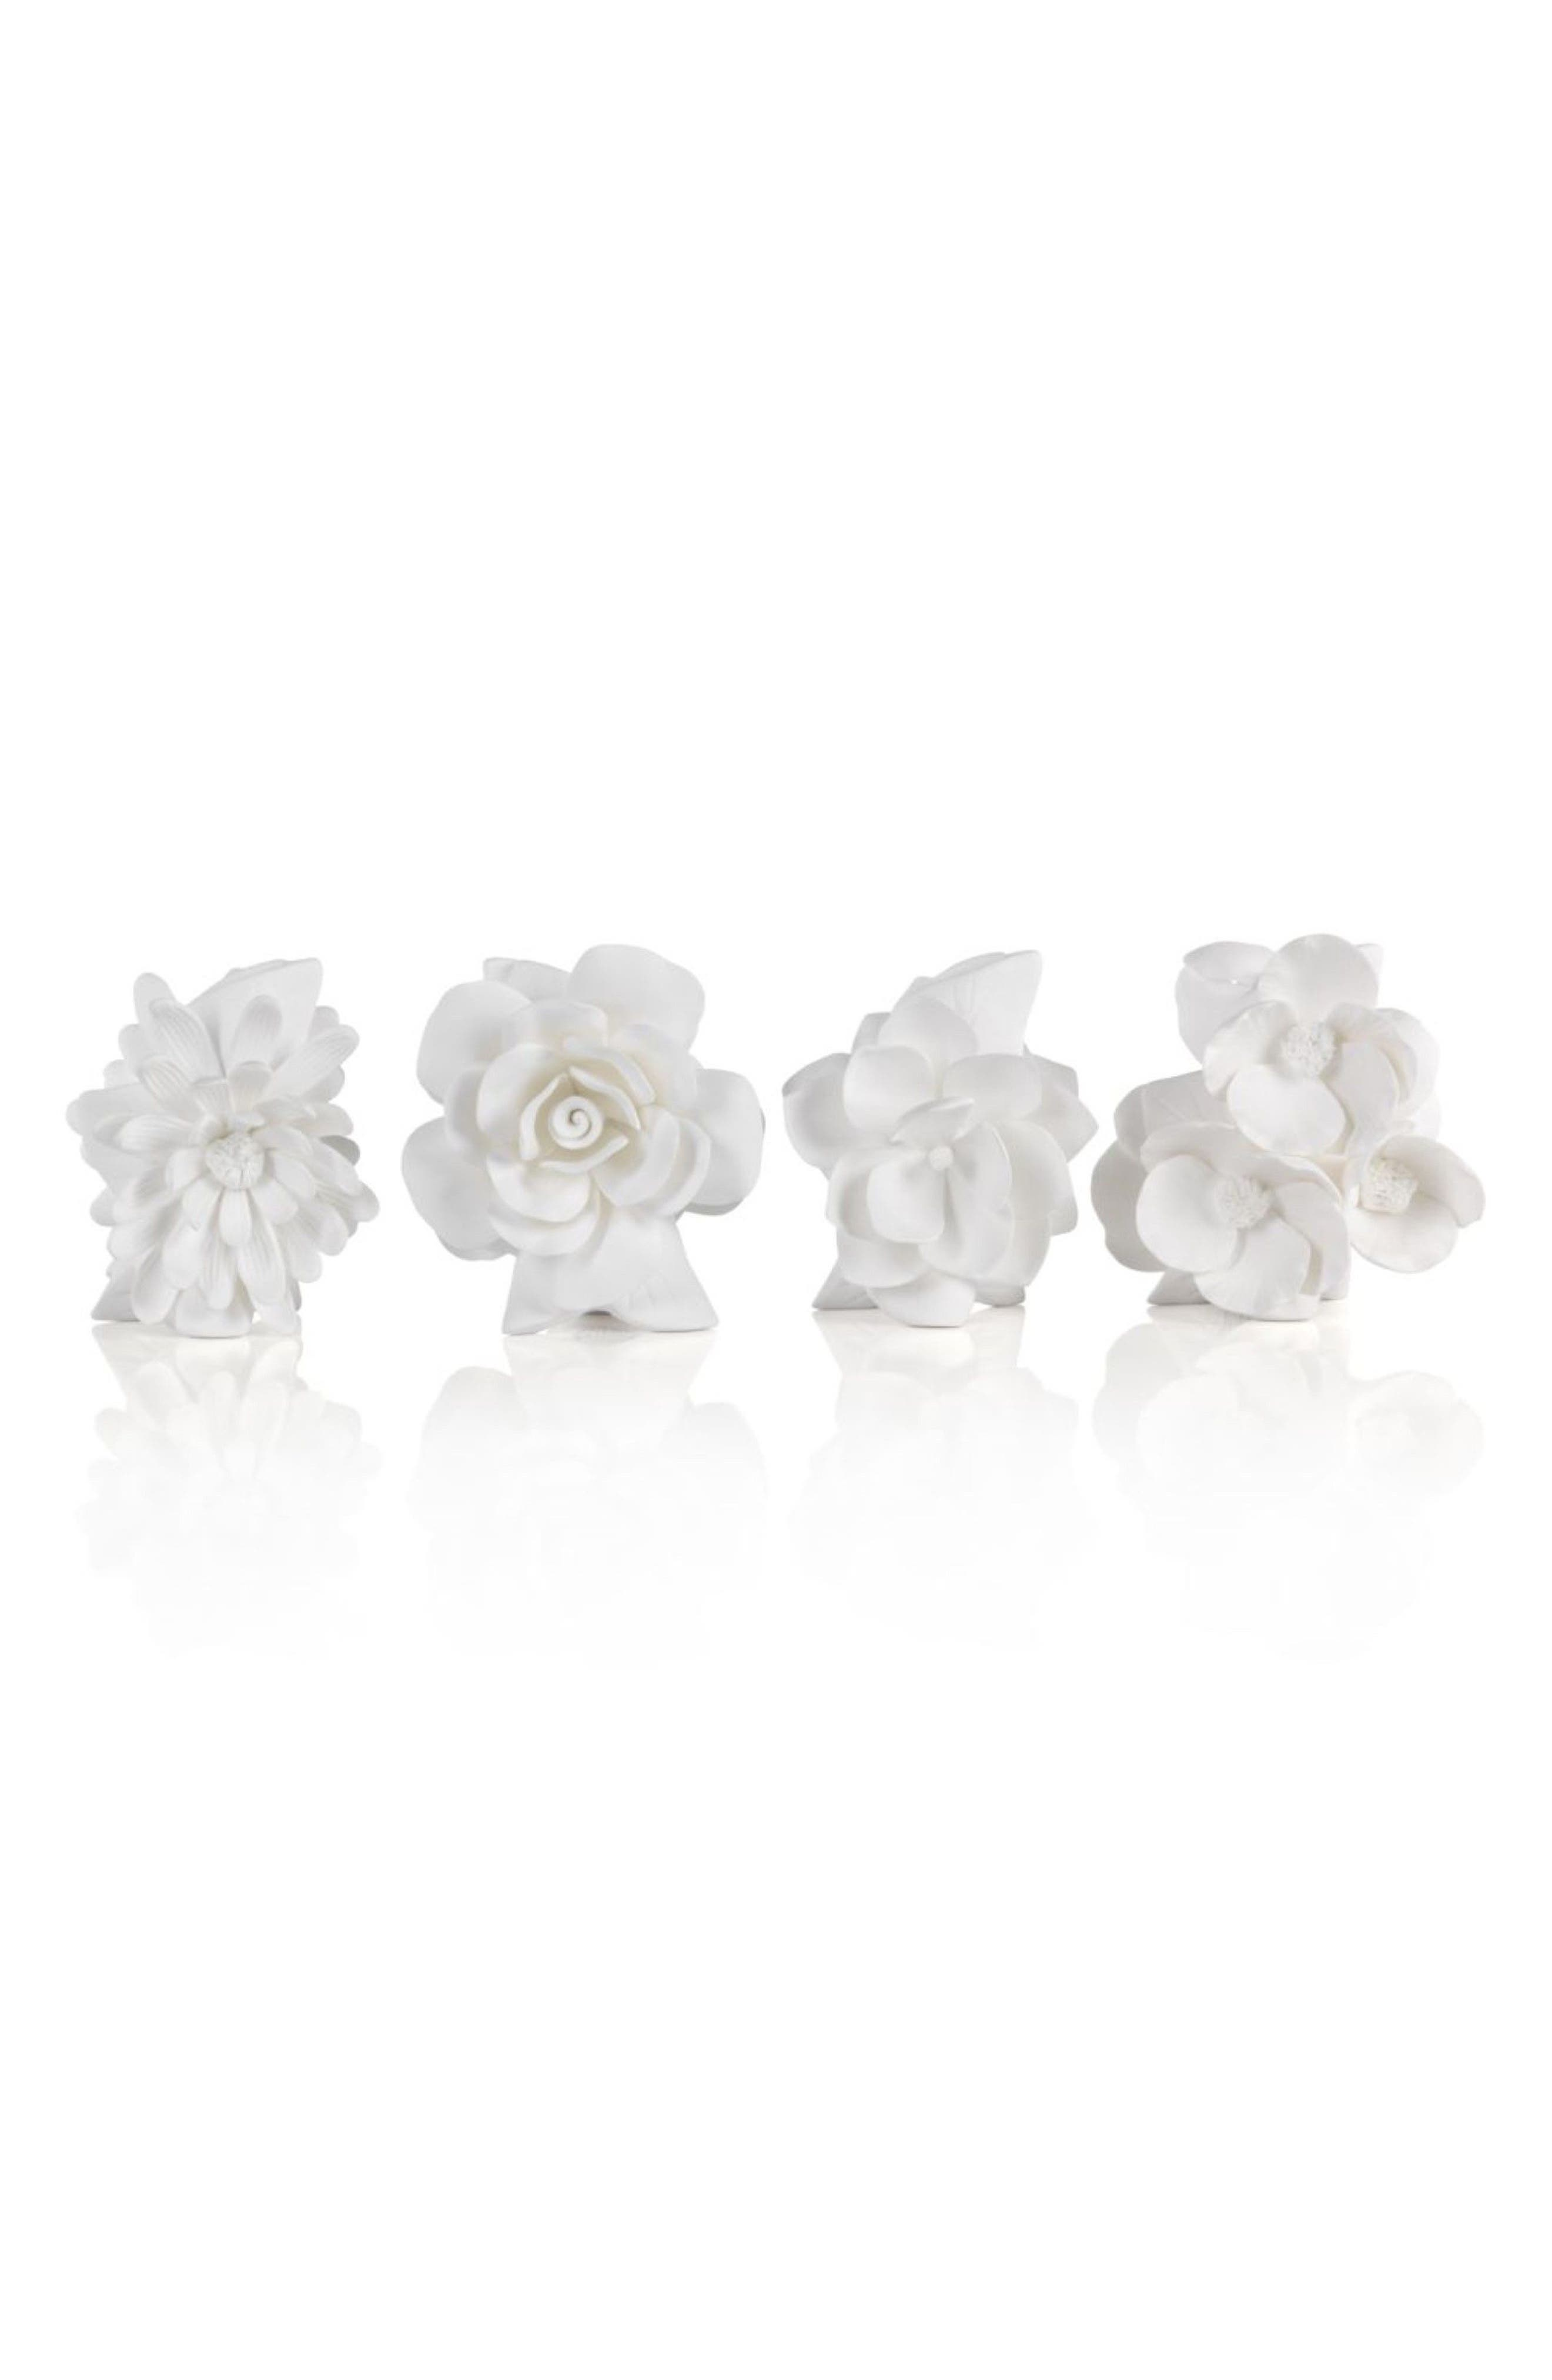 Cameo Set of 4 Porcelain Vases,                         Main,                         color, White